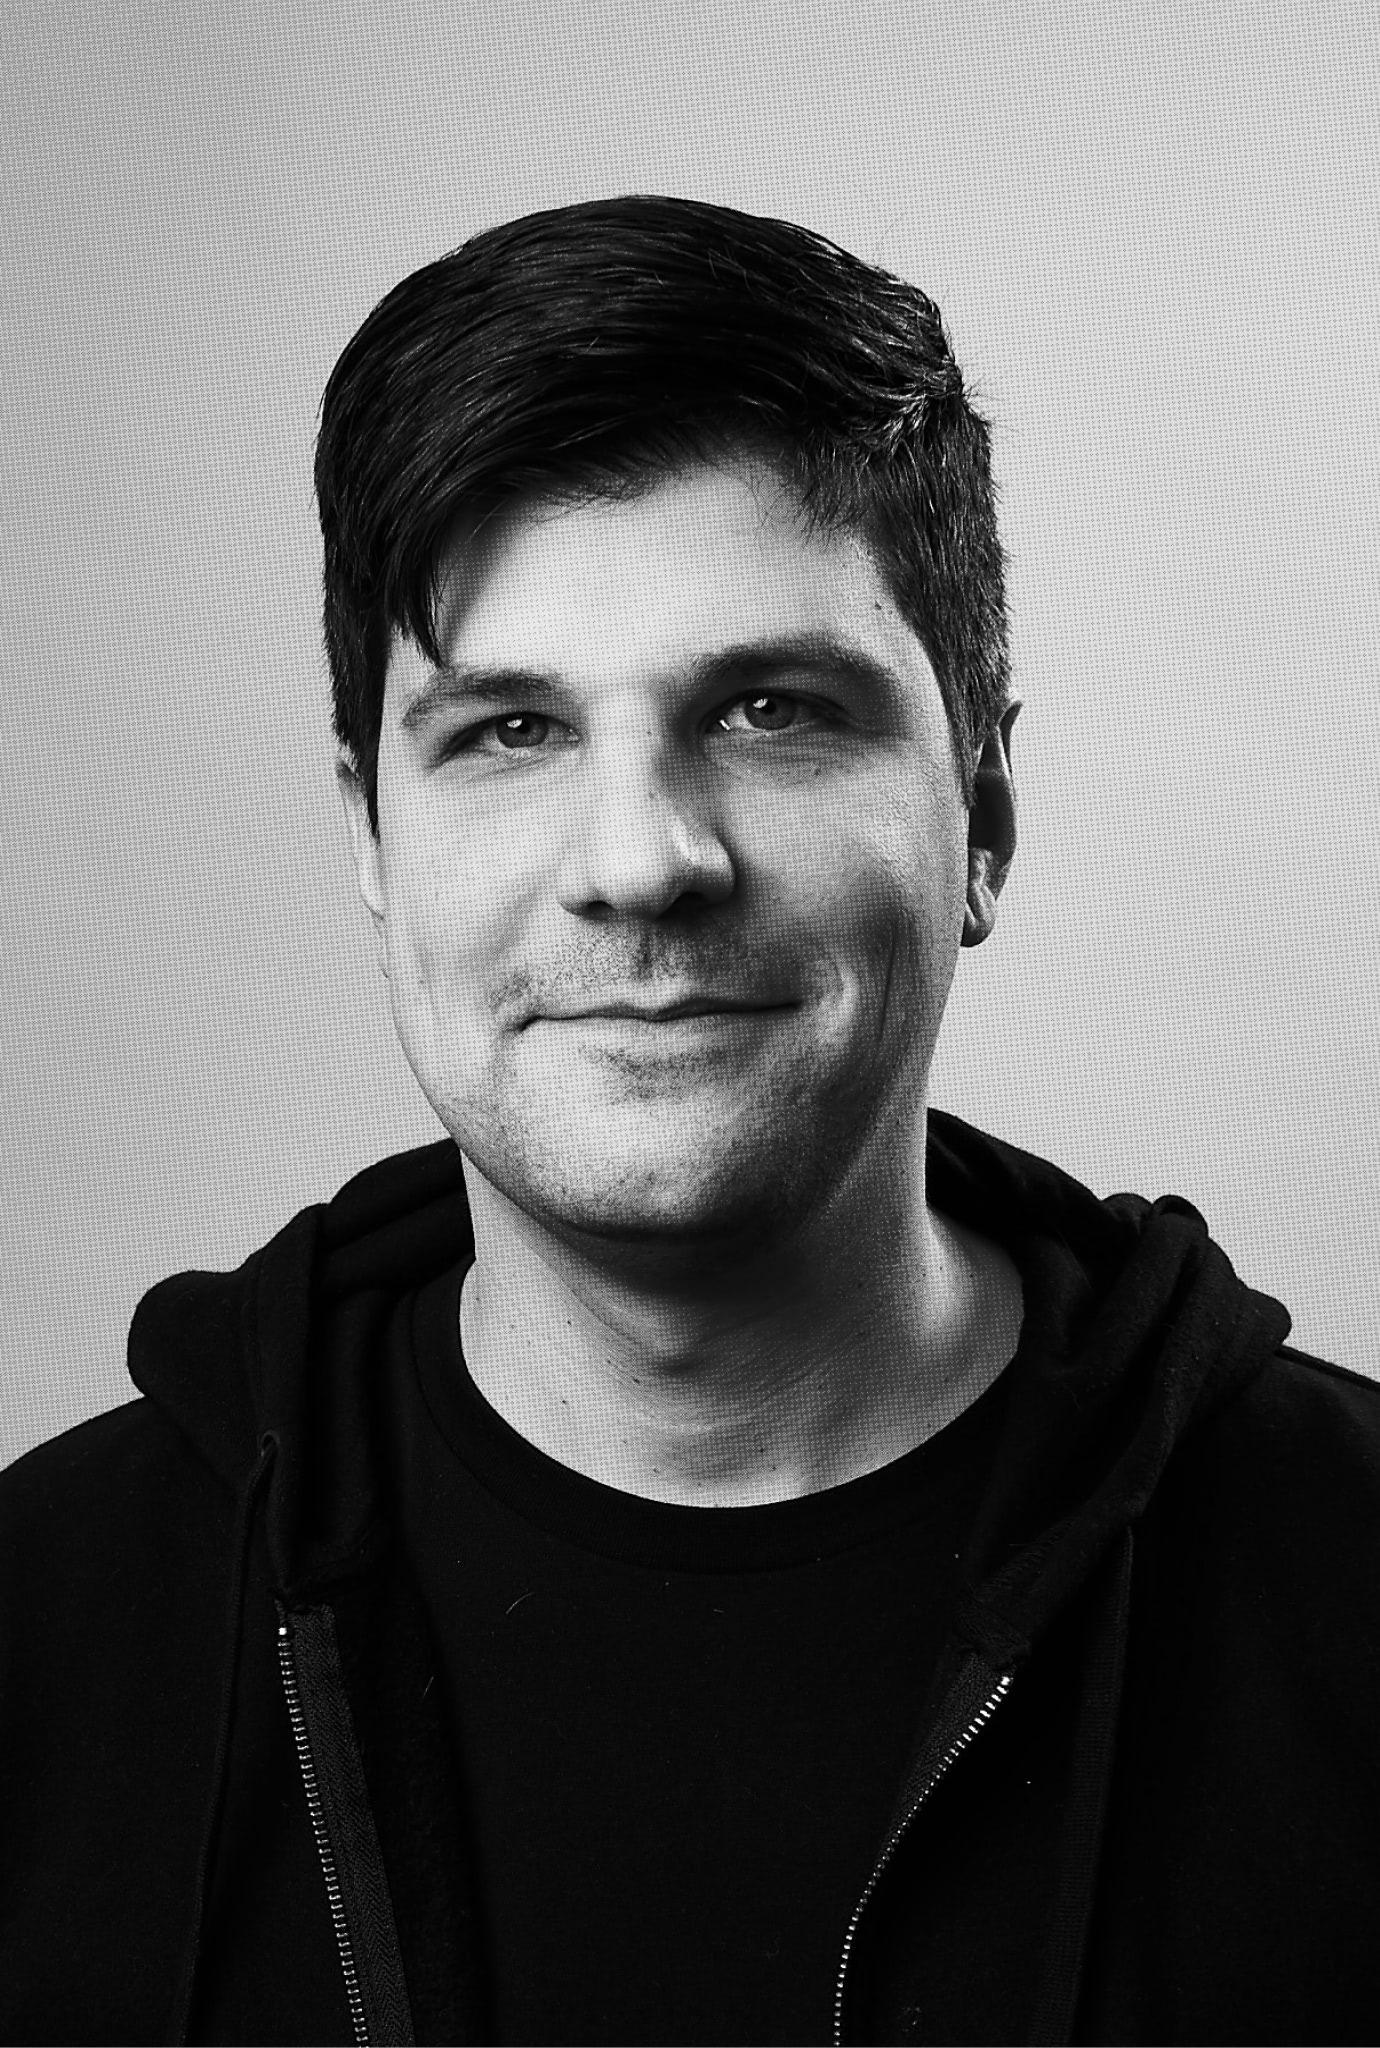 Photo of Marc Debiak in black and white